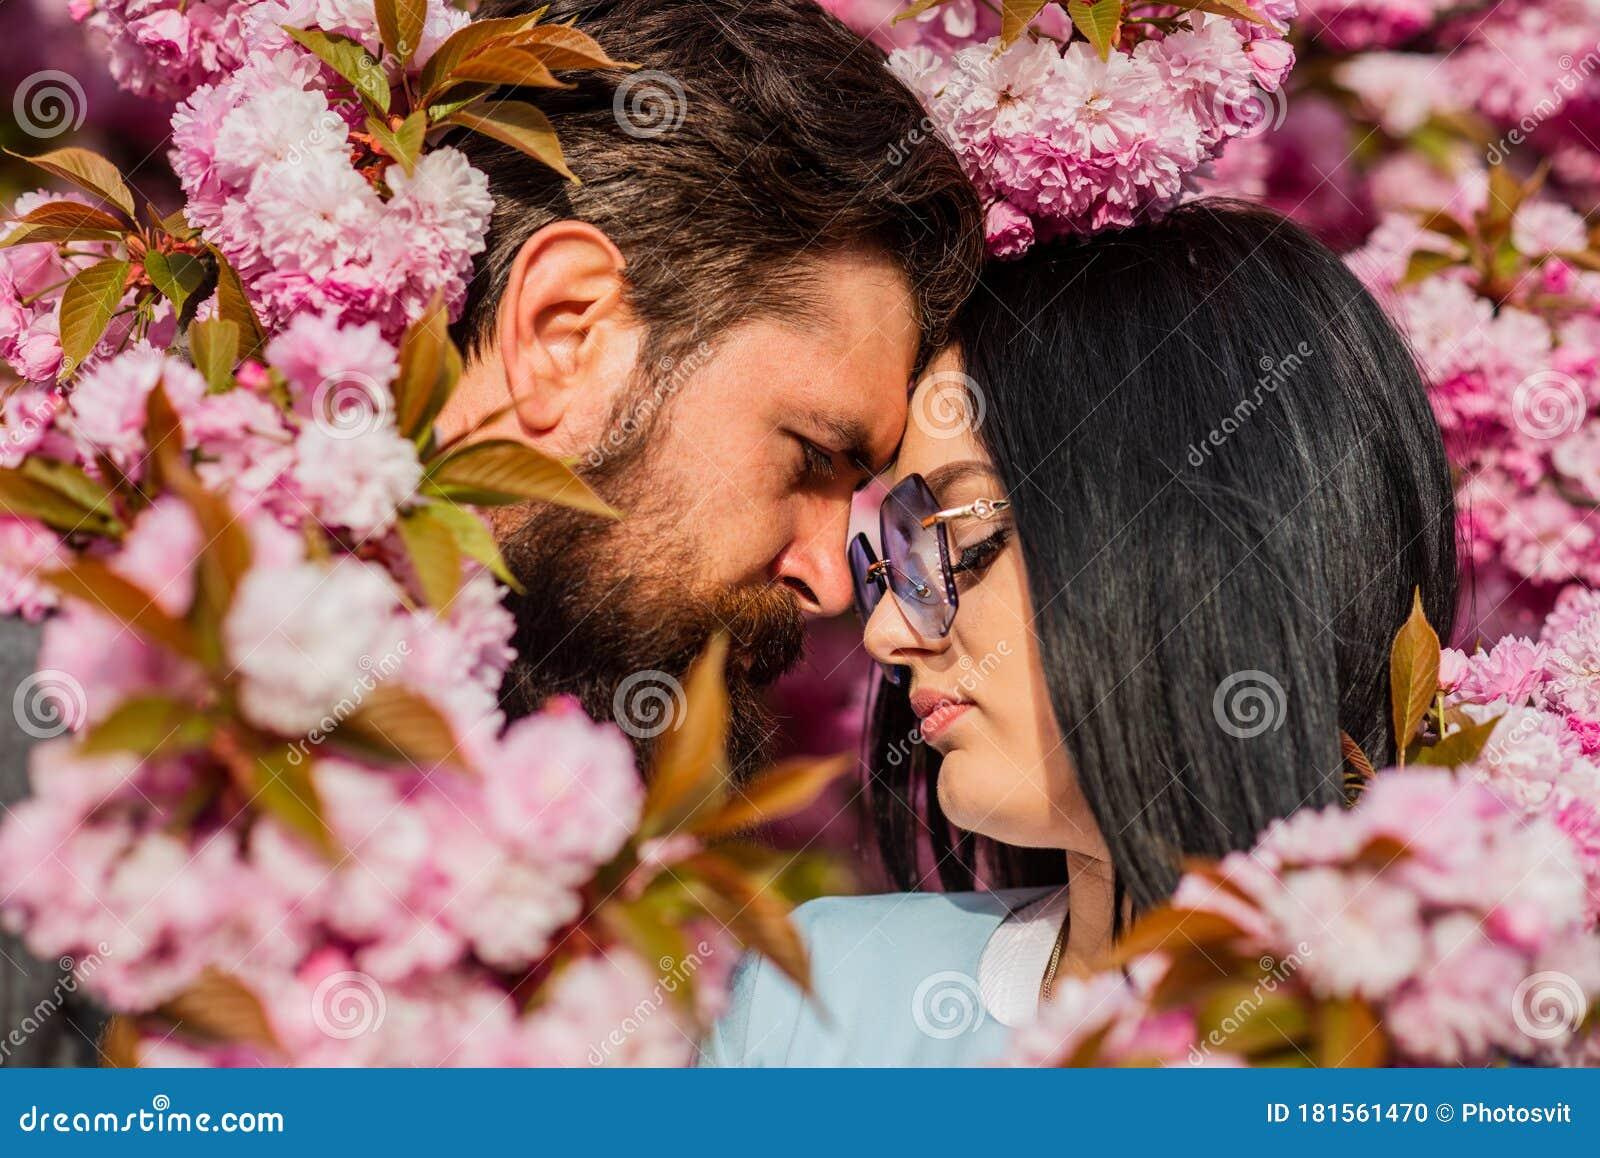 dating online kettering